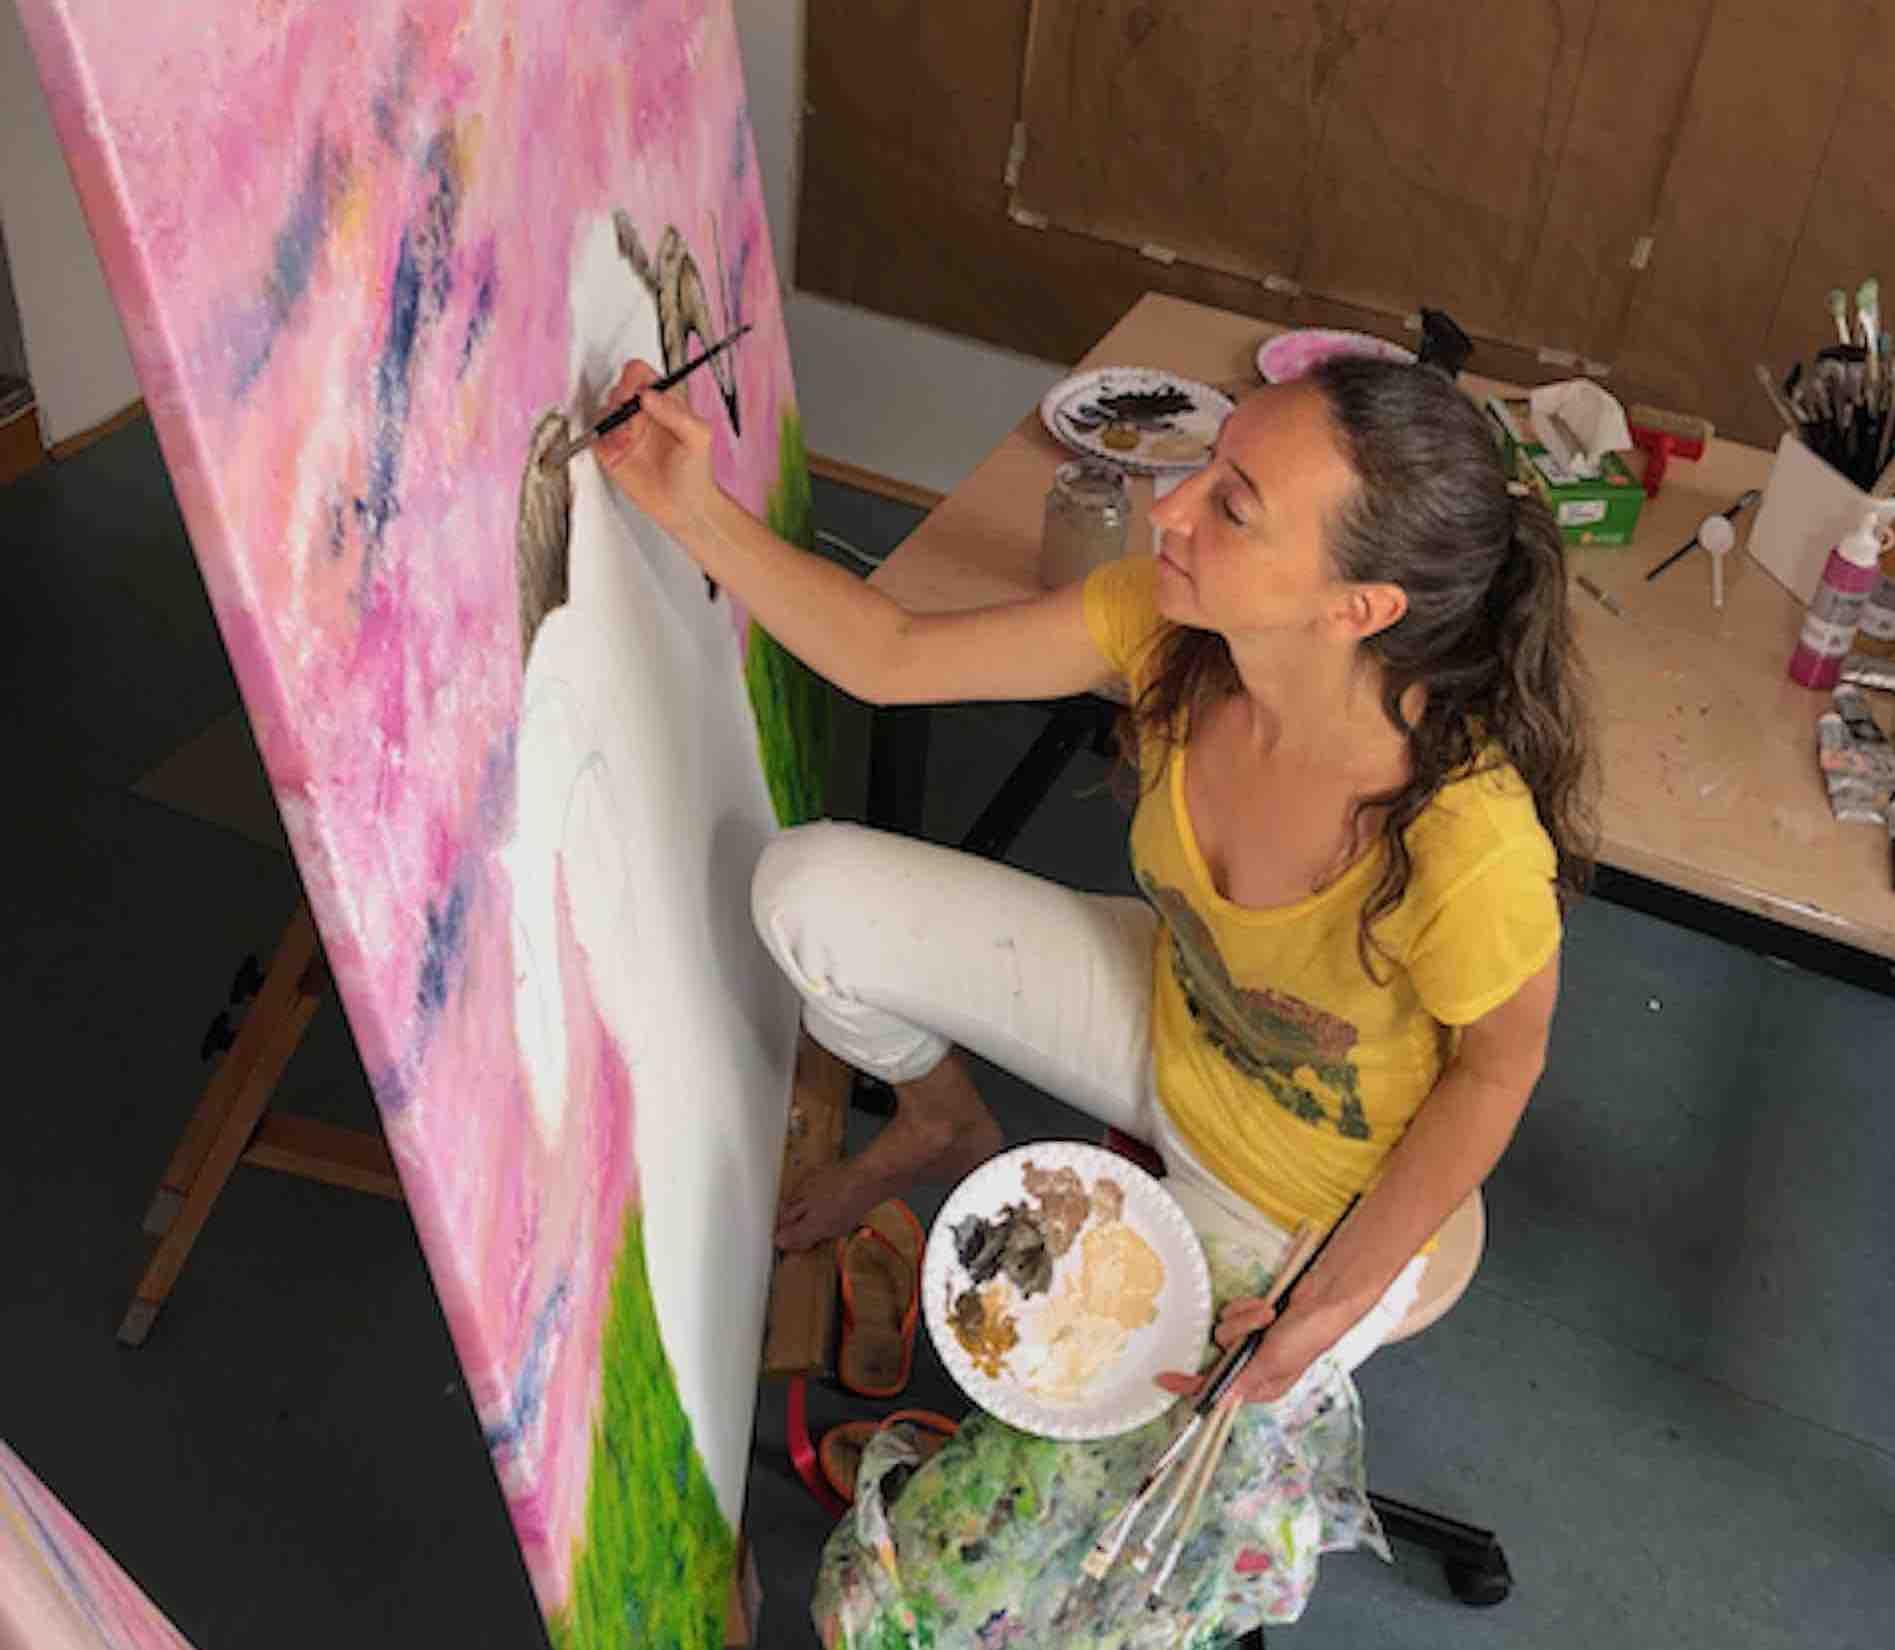 Claudia Botz - CeBo - beim Malen